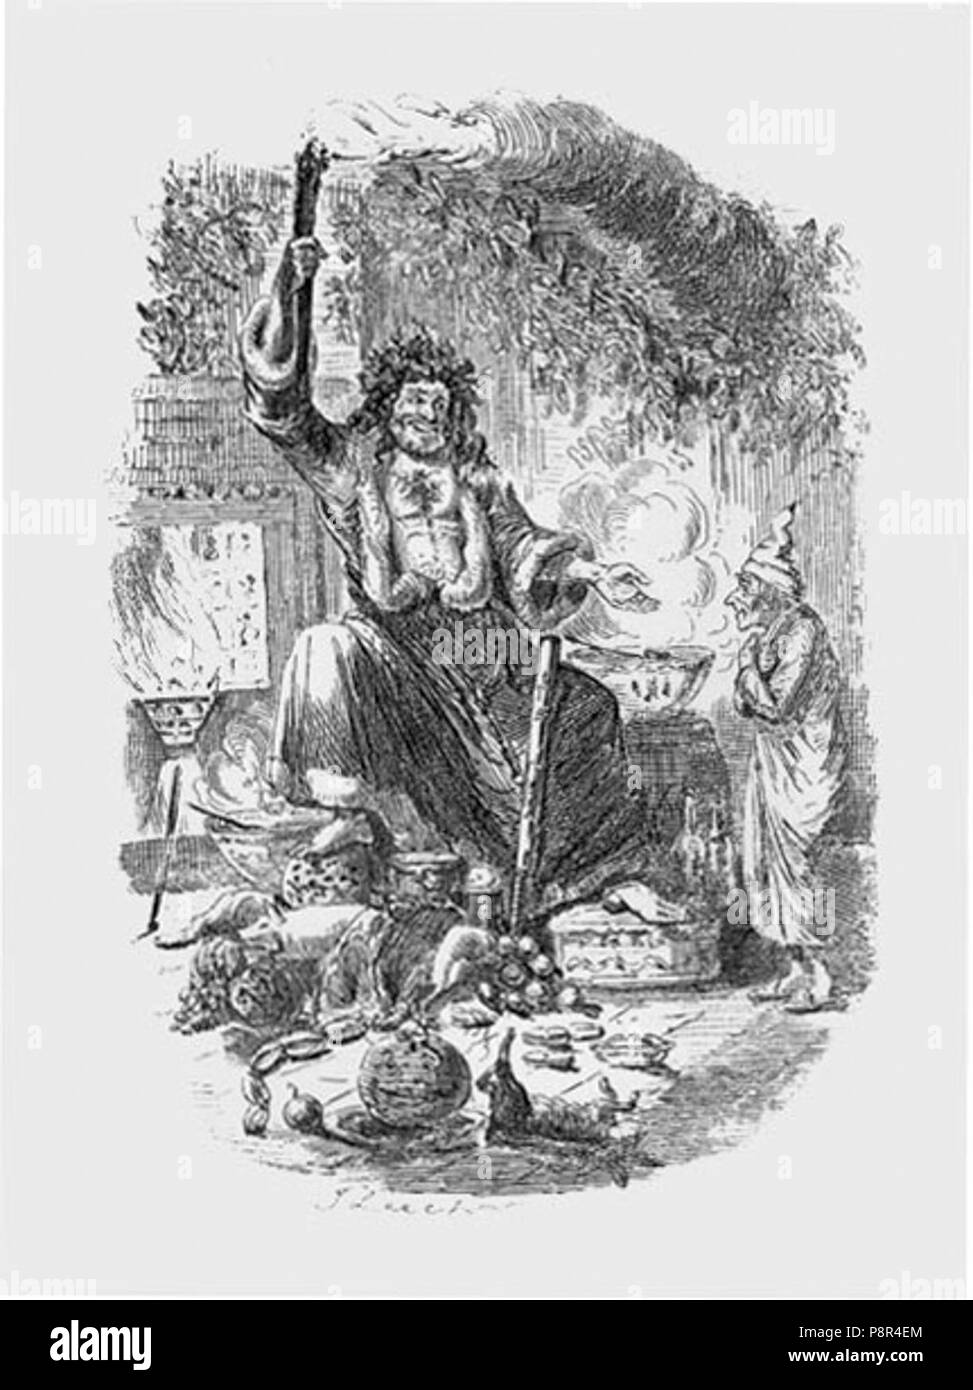 A Christmas Carol Spirits.A Christmas Carol The Second Of The Three Spirits By John